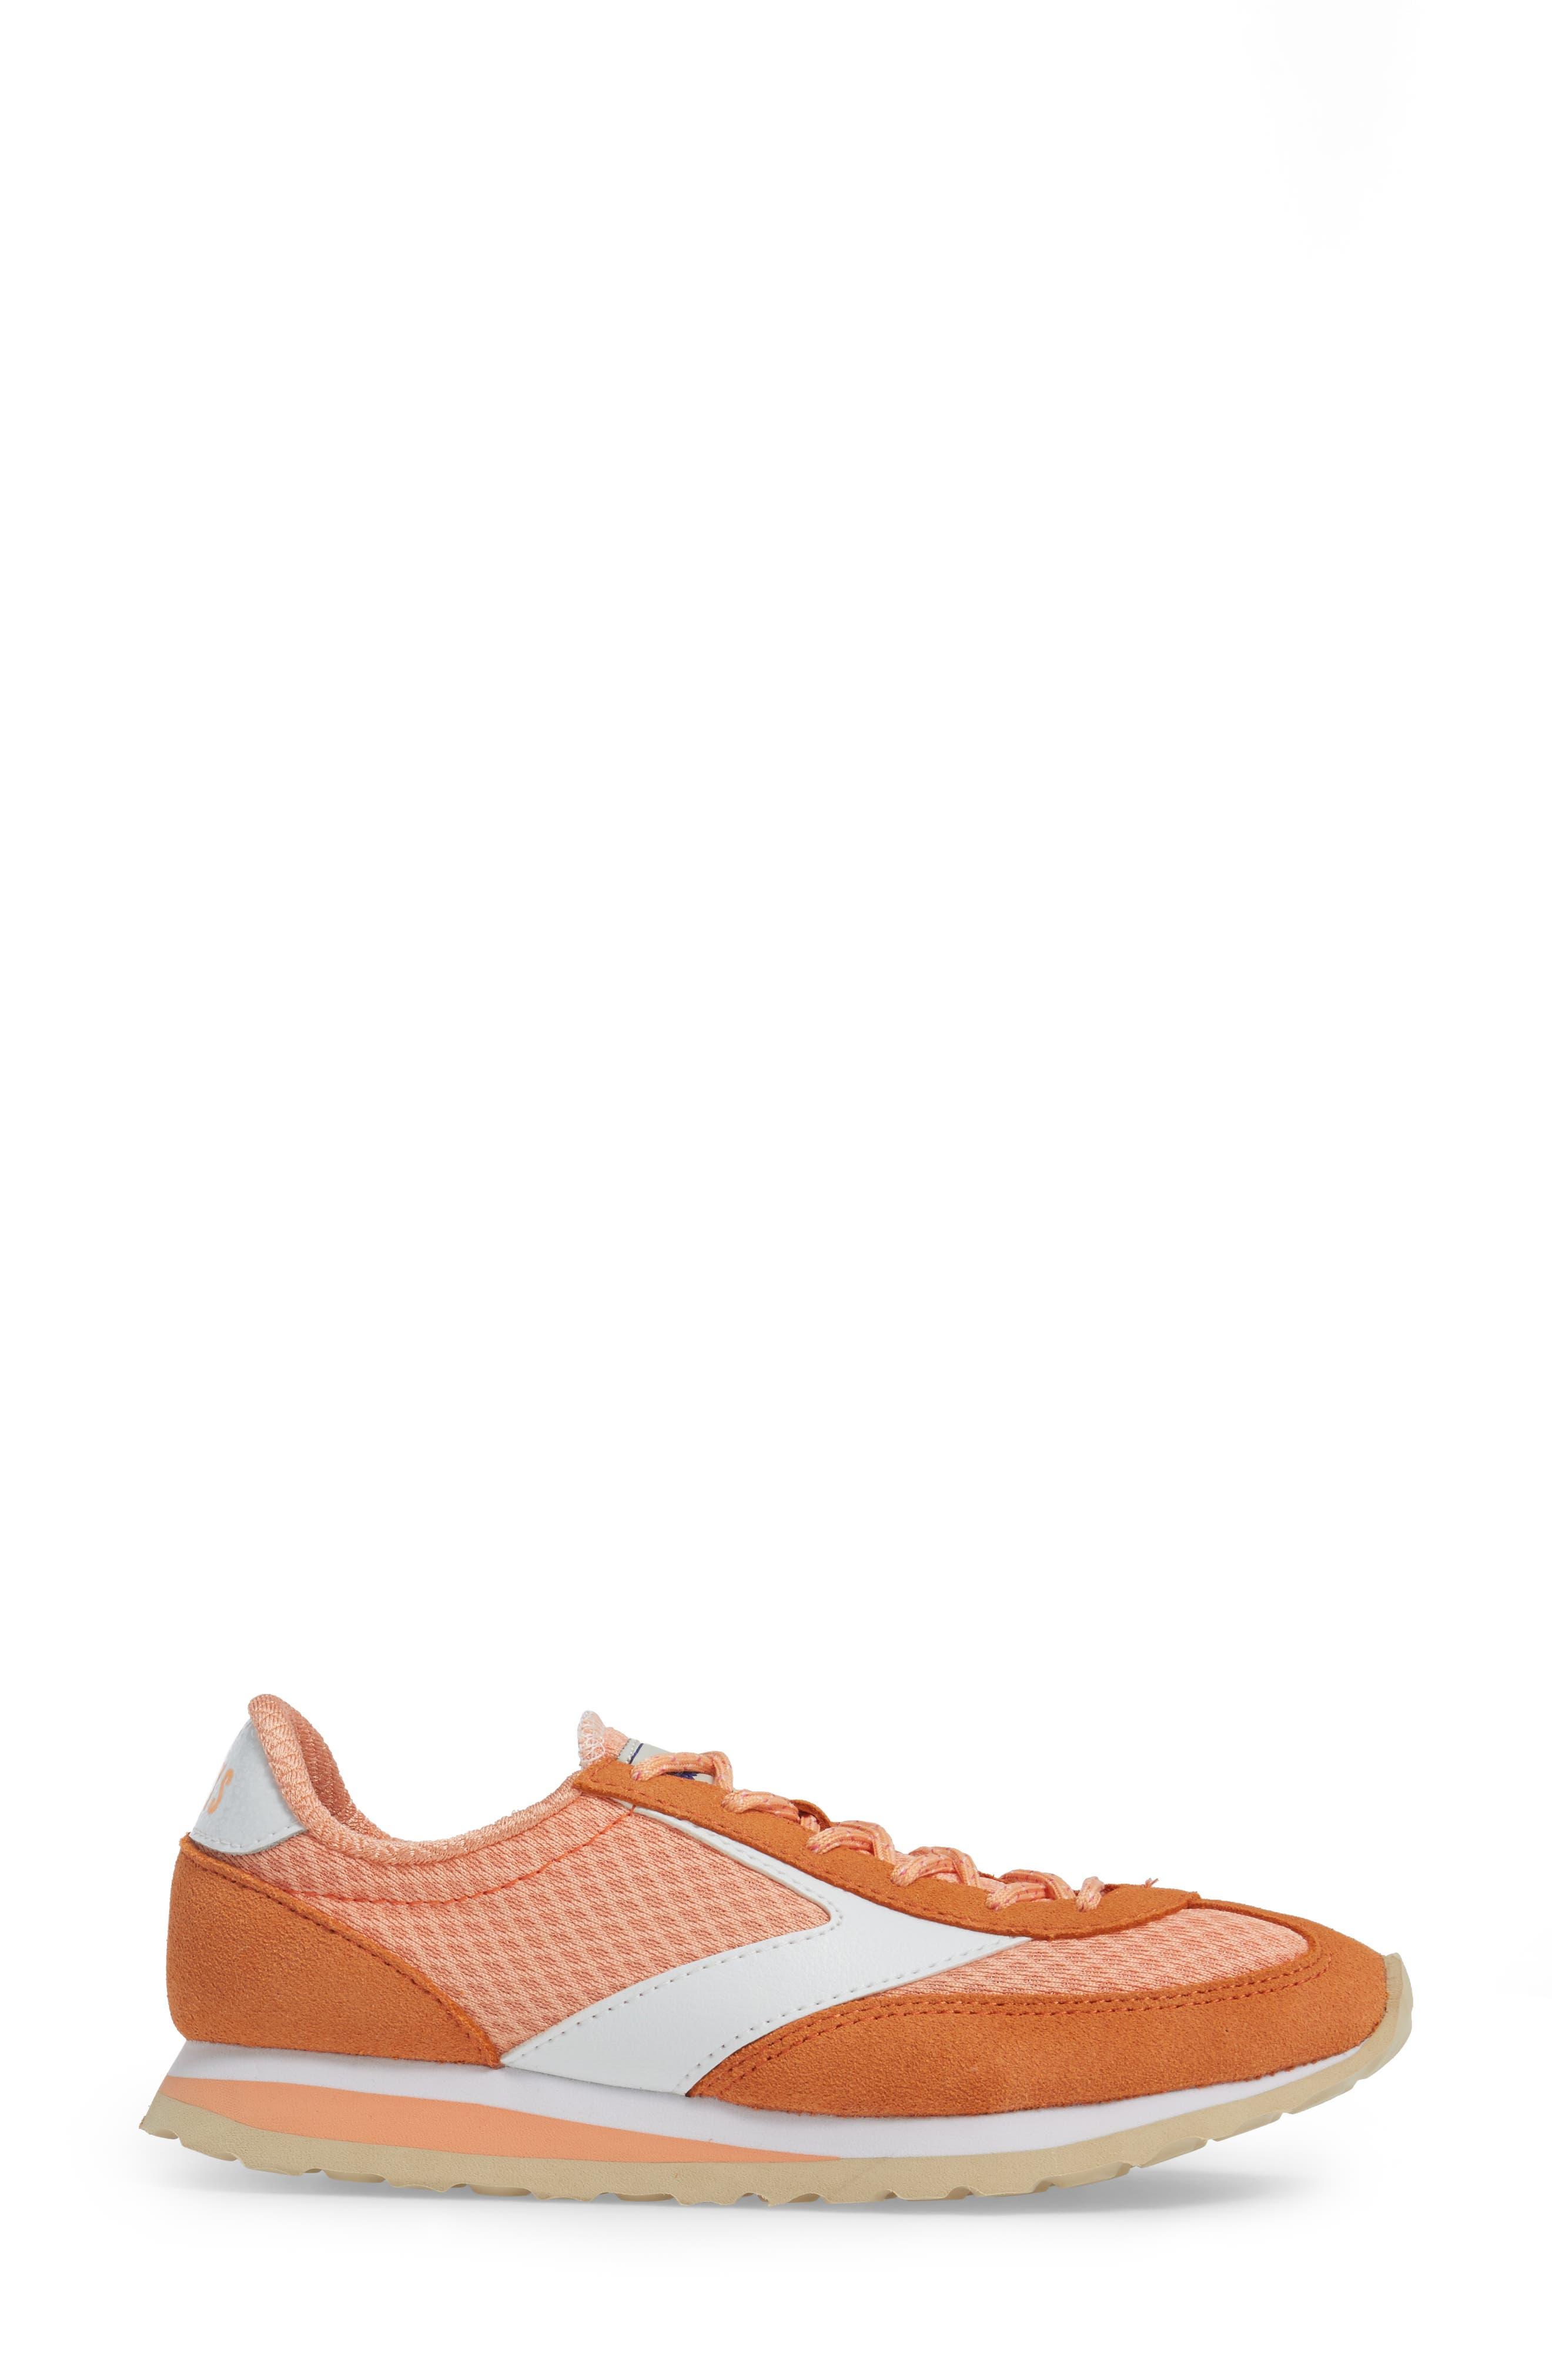 'Vanguard' Sneaker,                             Alternate thumbnail 96, color,